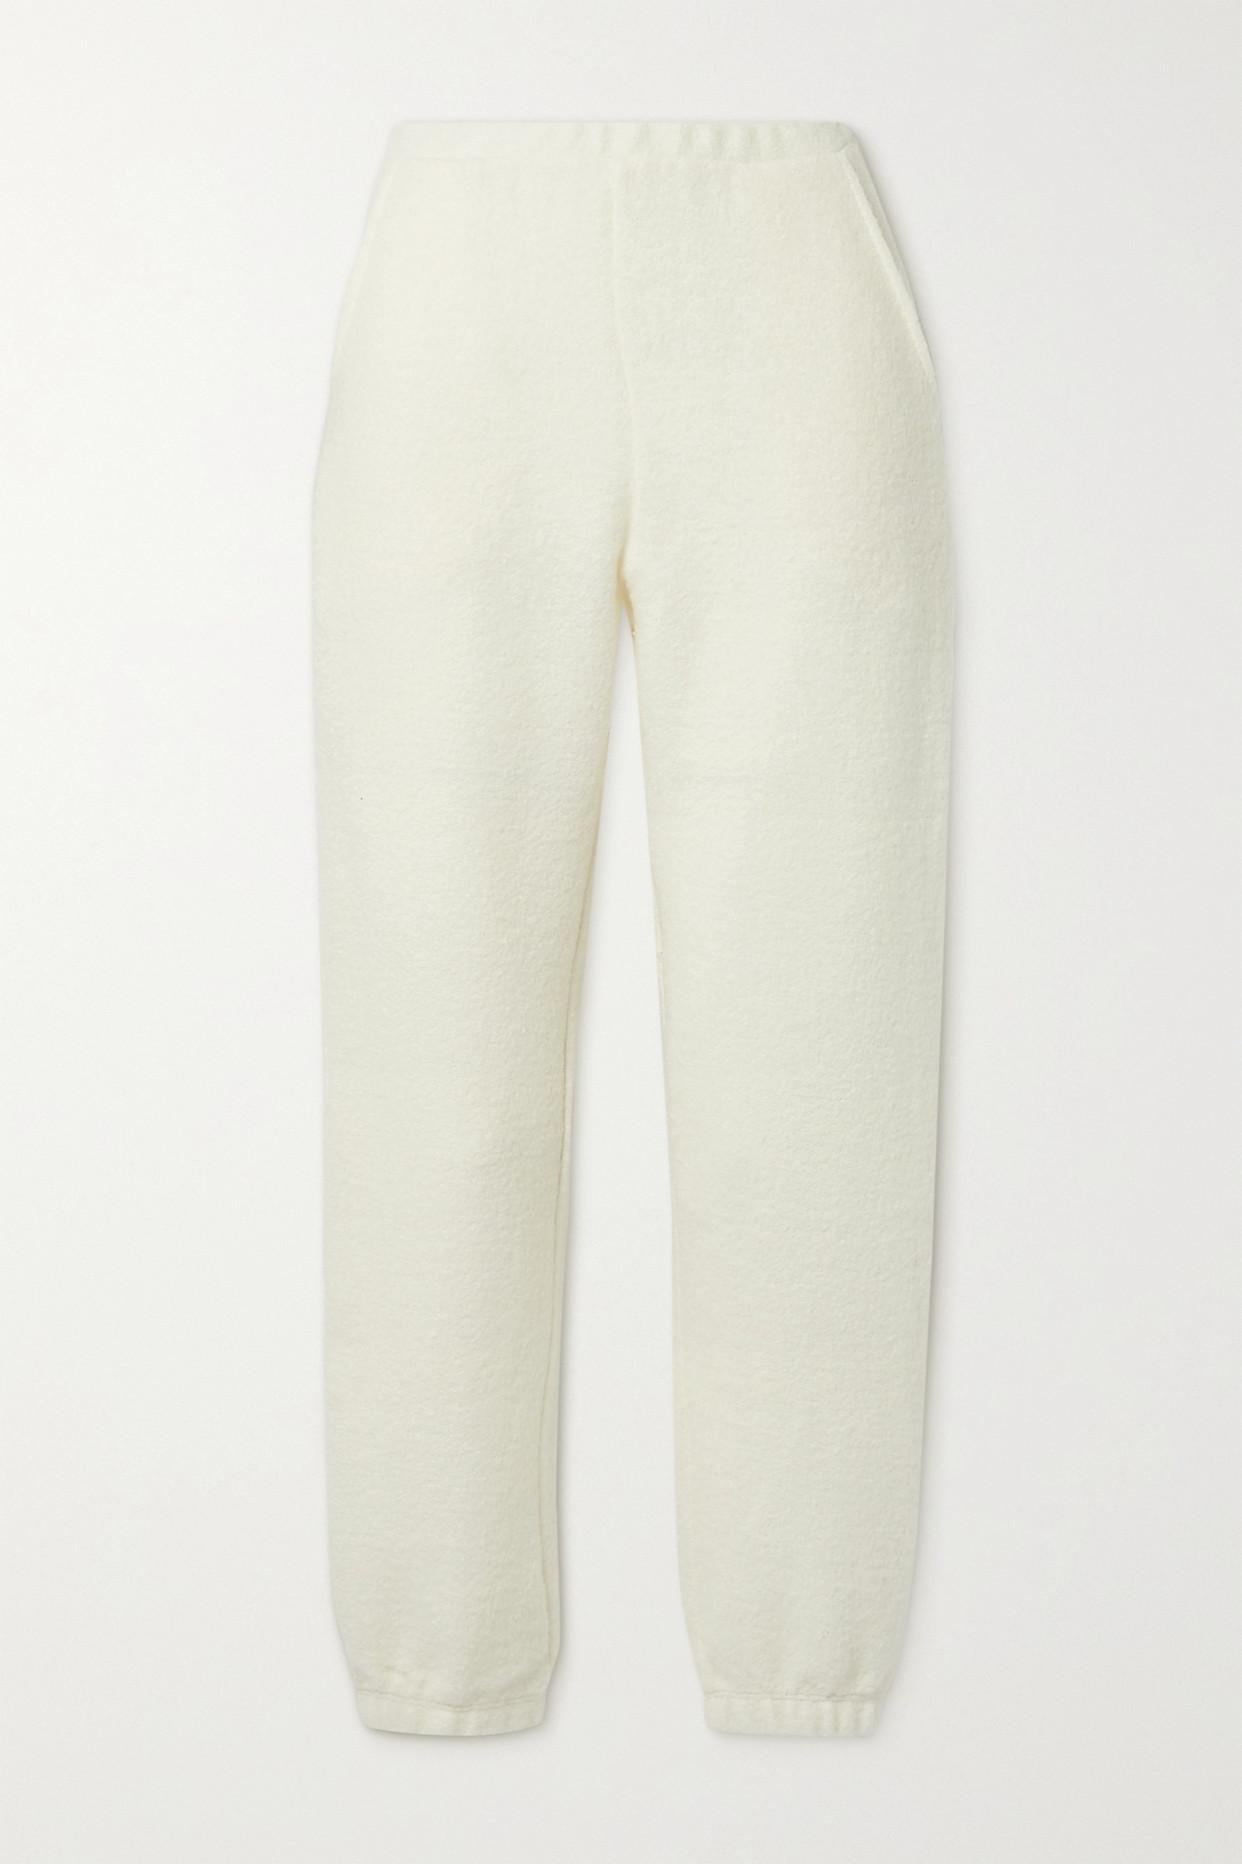 LESET - Bella 羊毛混纺休闲裤 - 奶油色 - medium